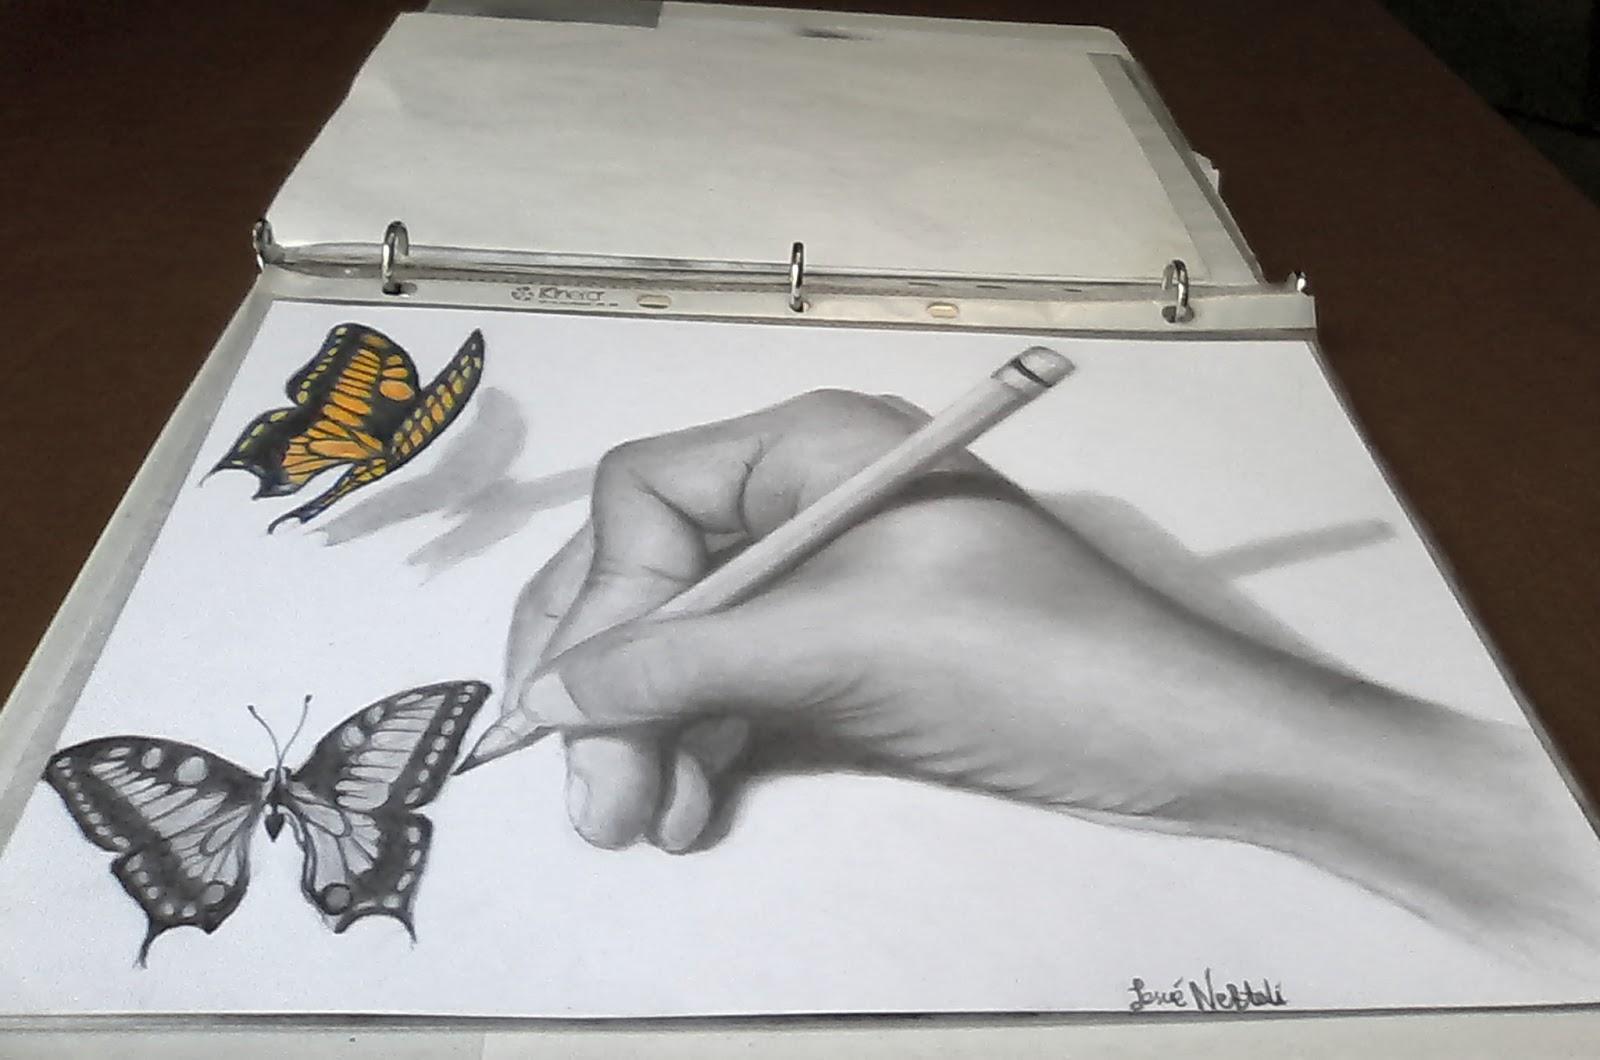 Josue Neftali Artist 3d Drawings Dibujos En 3d